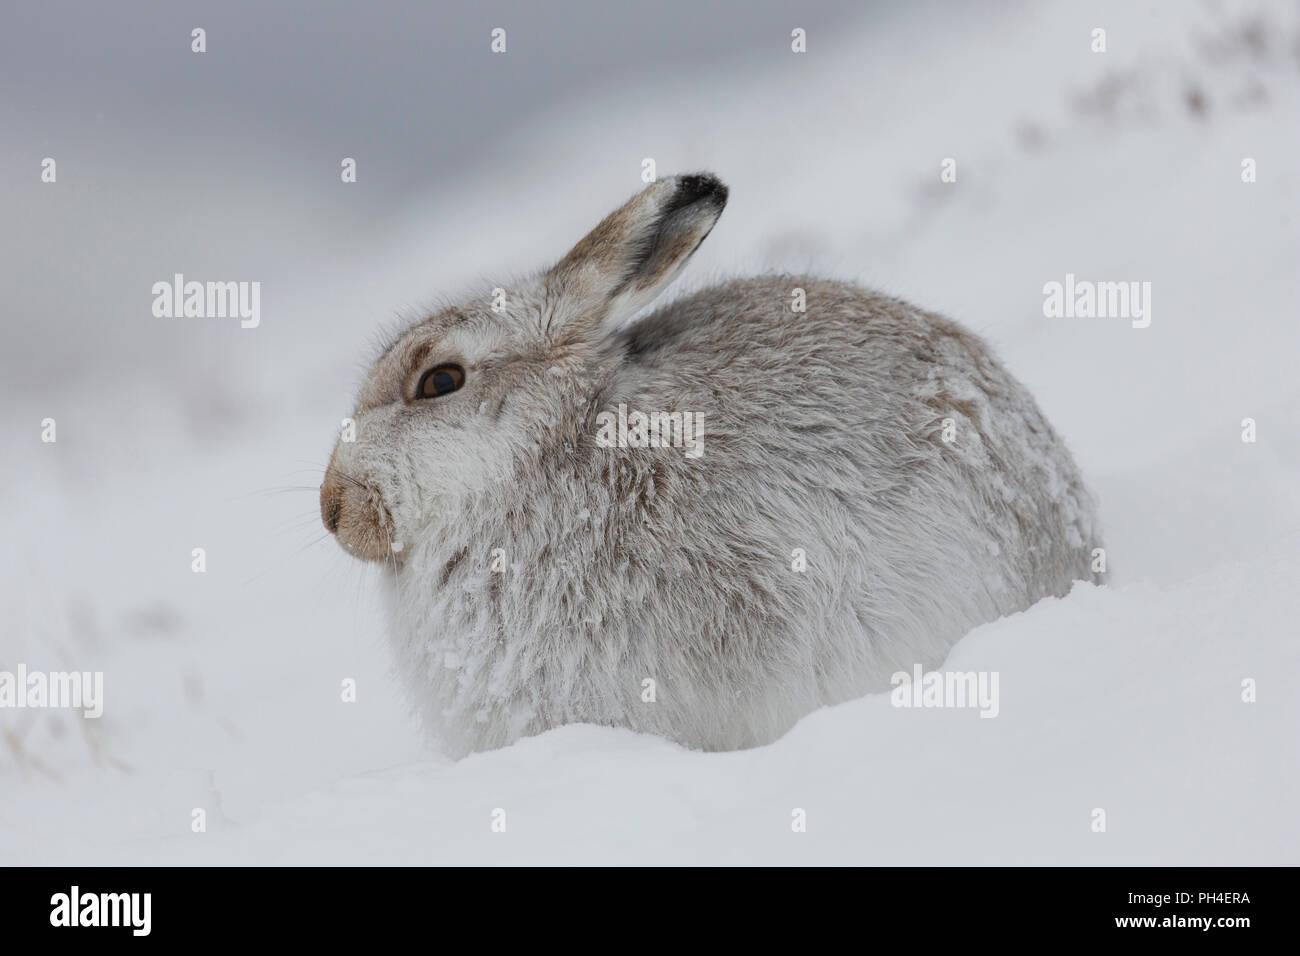 Mountain lepre (Lepus timidus). Adulti in bianco cappotto invernale (pelage) nella neve. Cairngorms National Park, Scozia Immagini Stock